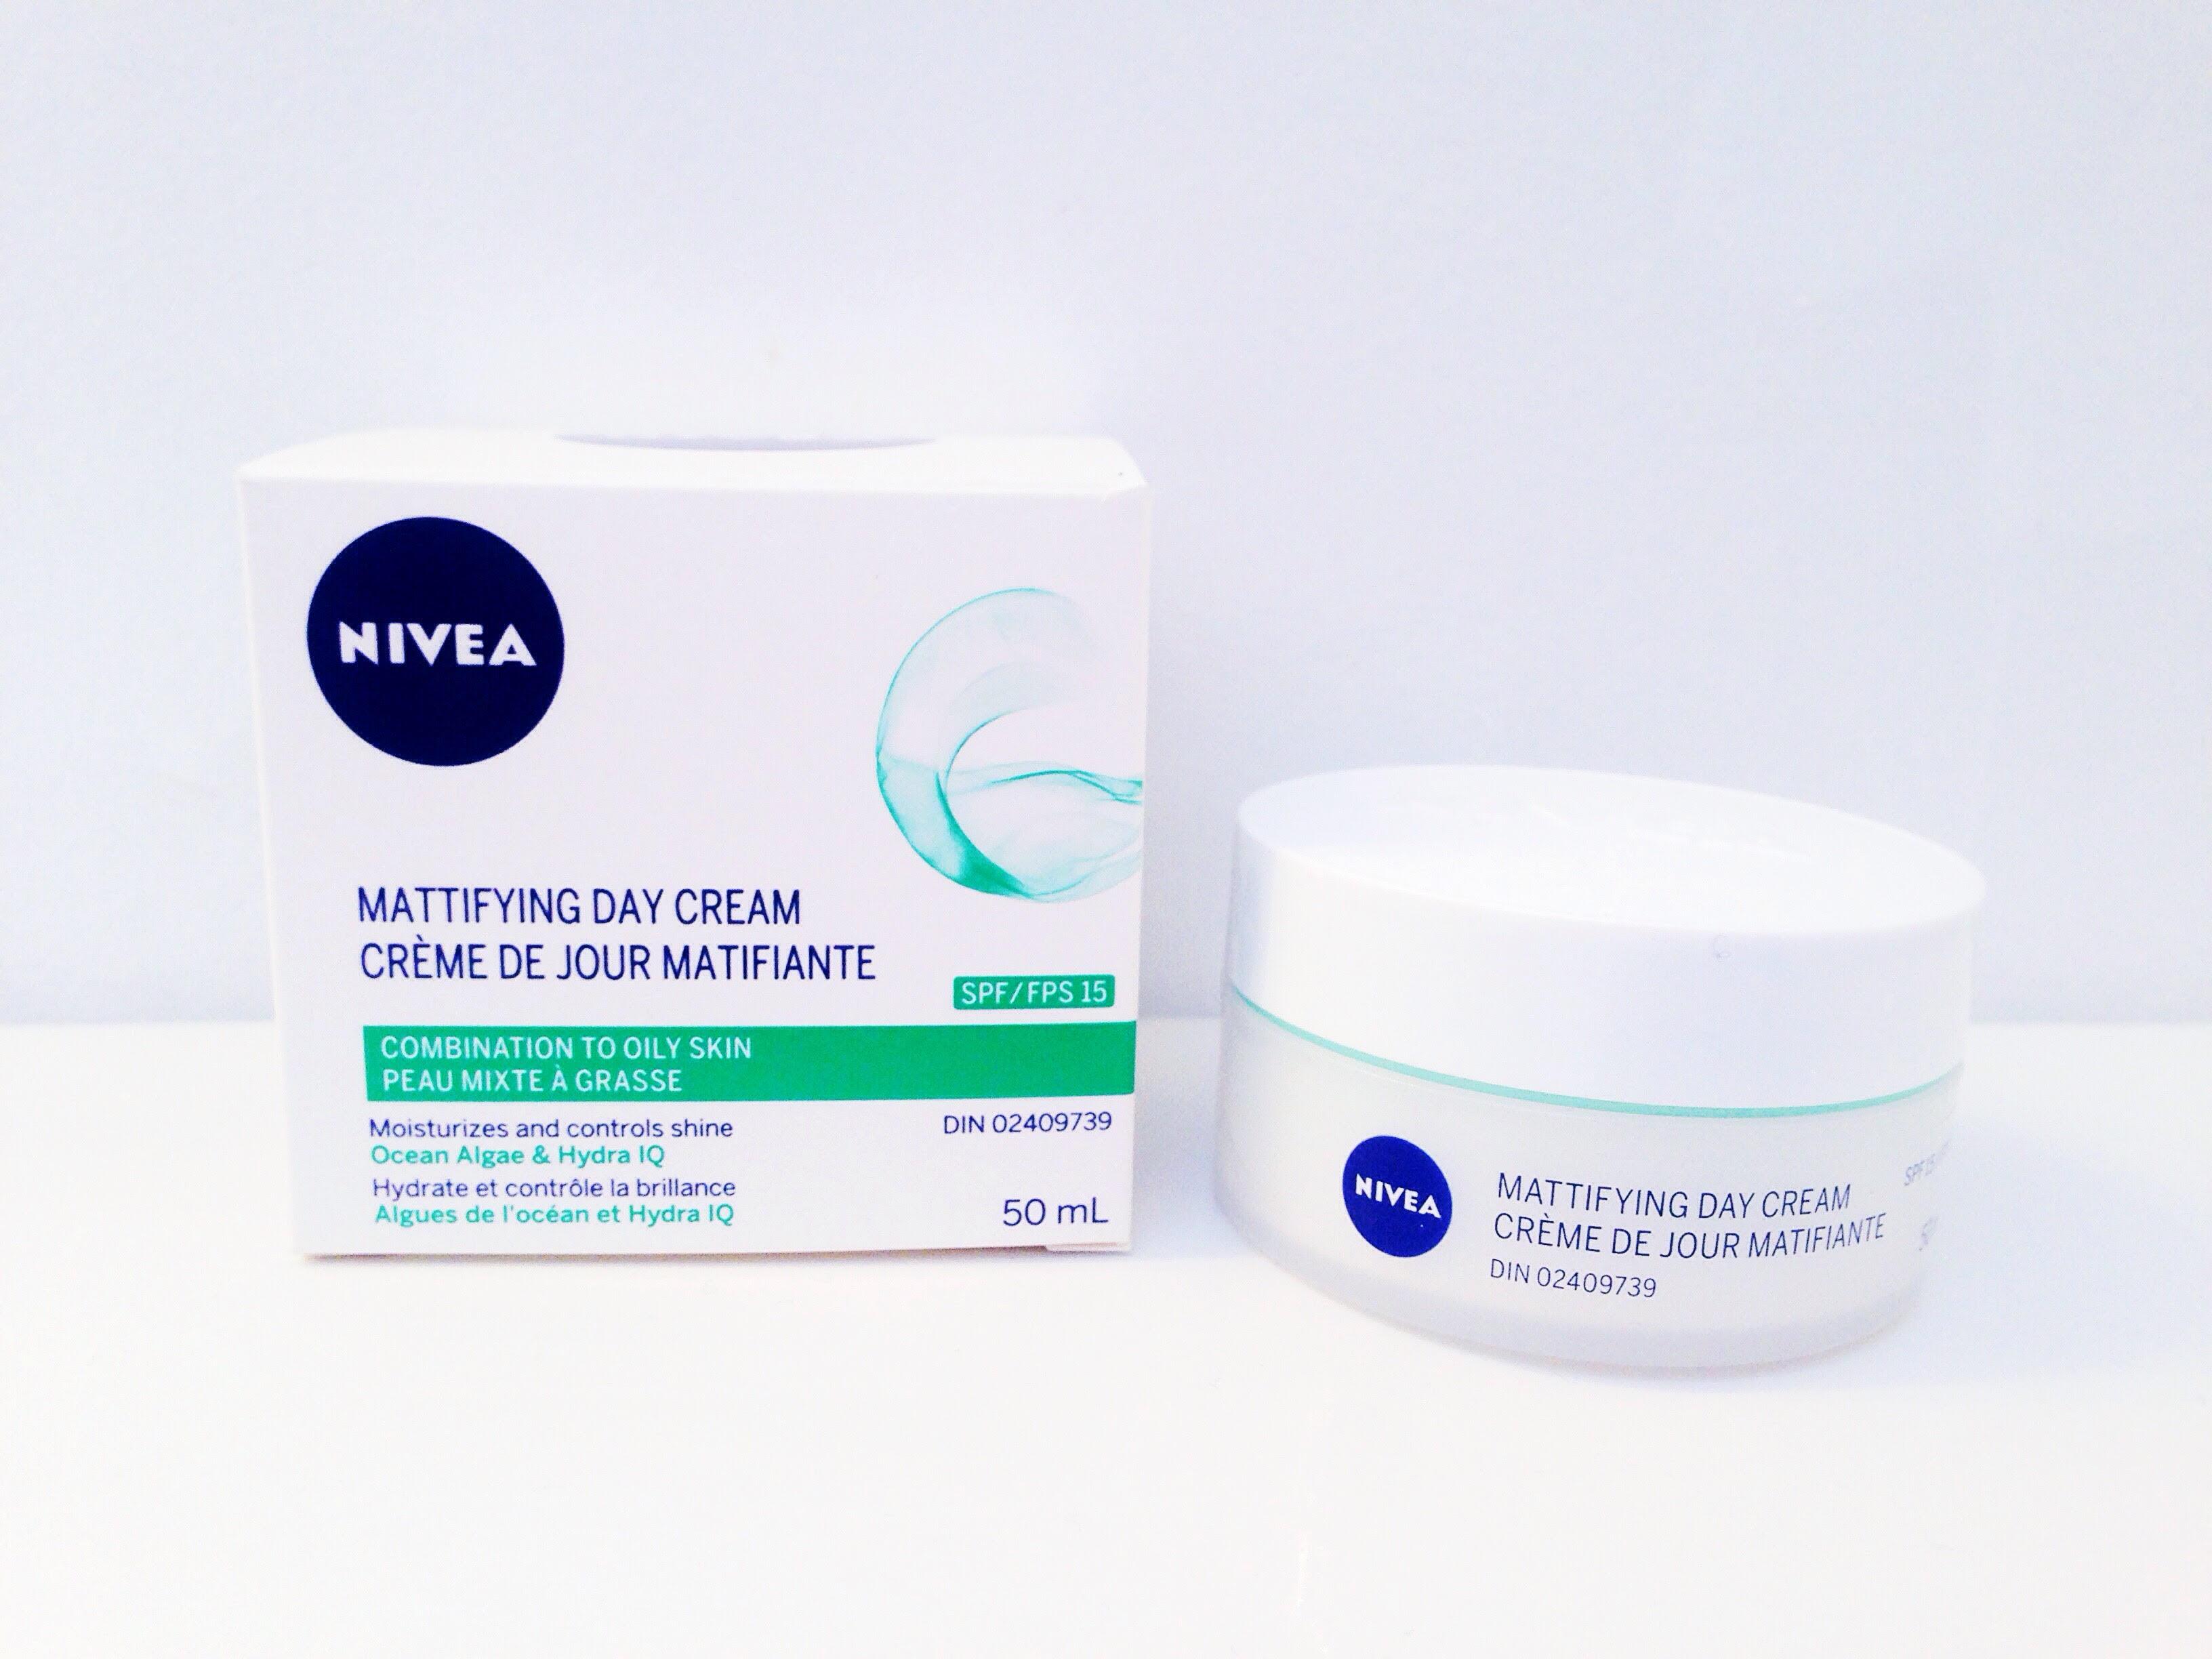 Nivea Mattifying Day Cream Review